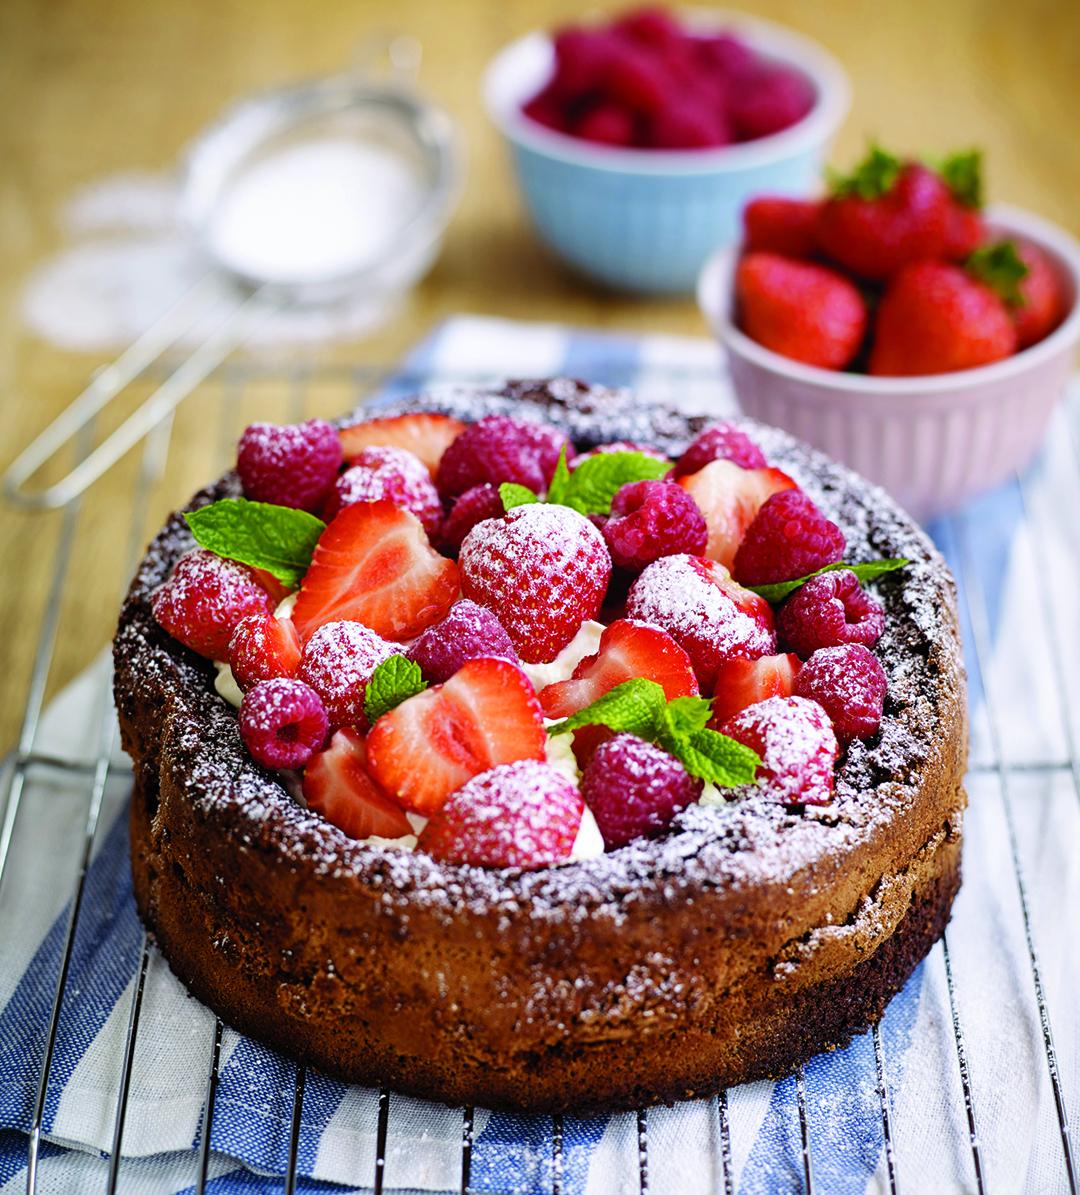 Gluten-free chocolate cake with berries